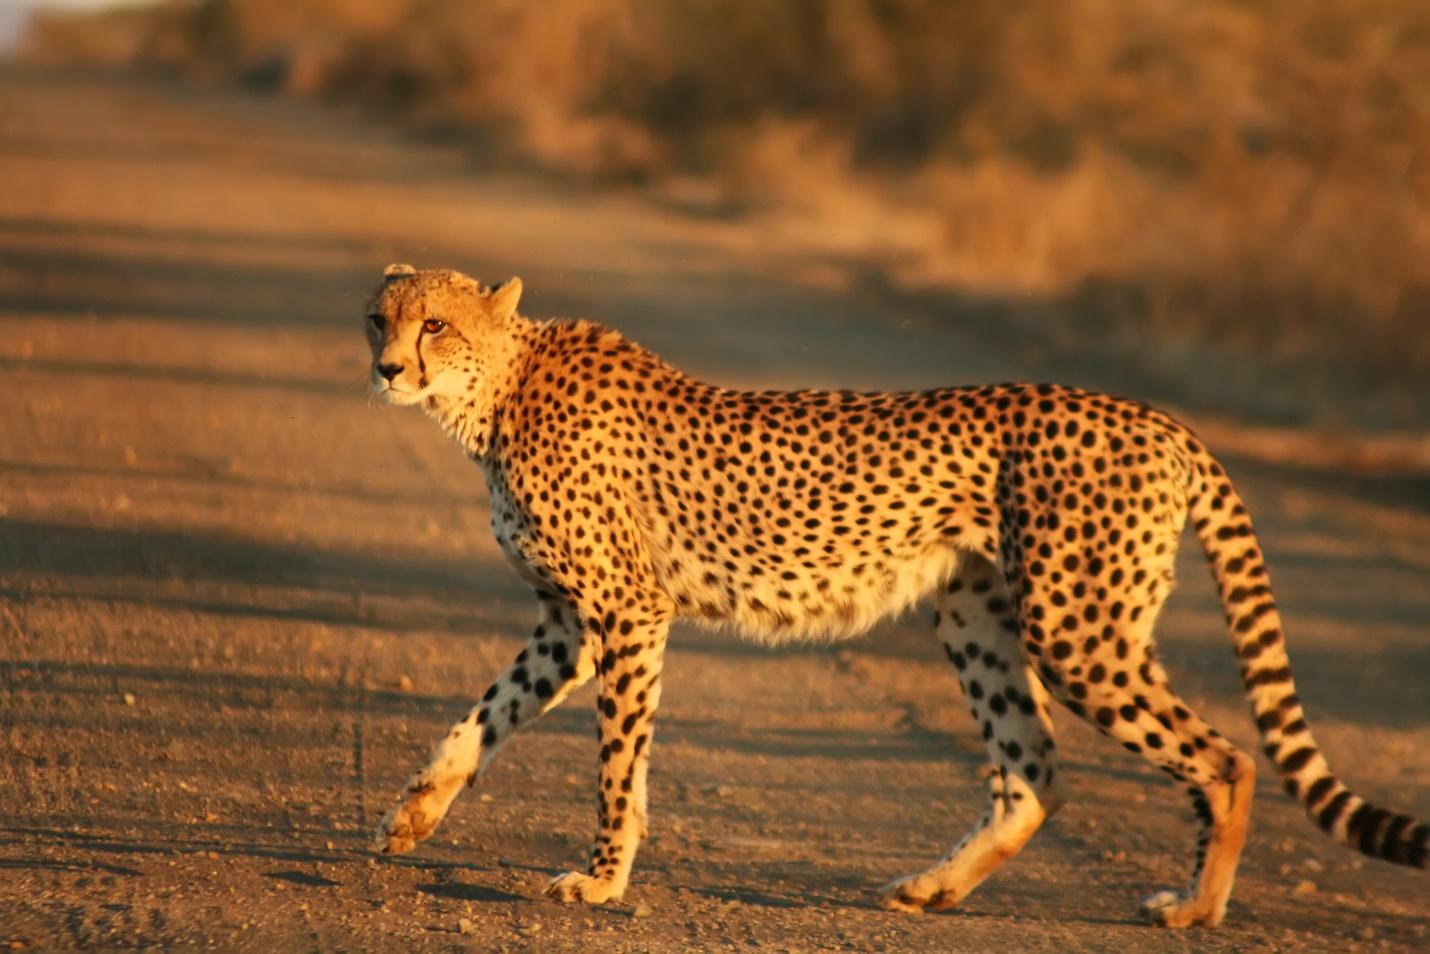 C:\Users\лд\AppData\Local\Microsoft\Windows\INetCache\Content.Word\Cheetah_Kruger.jpg